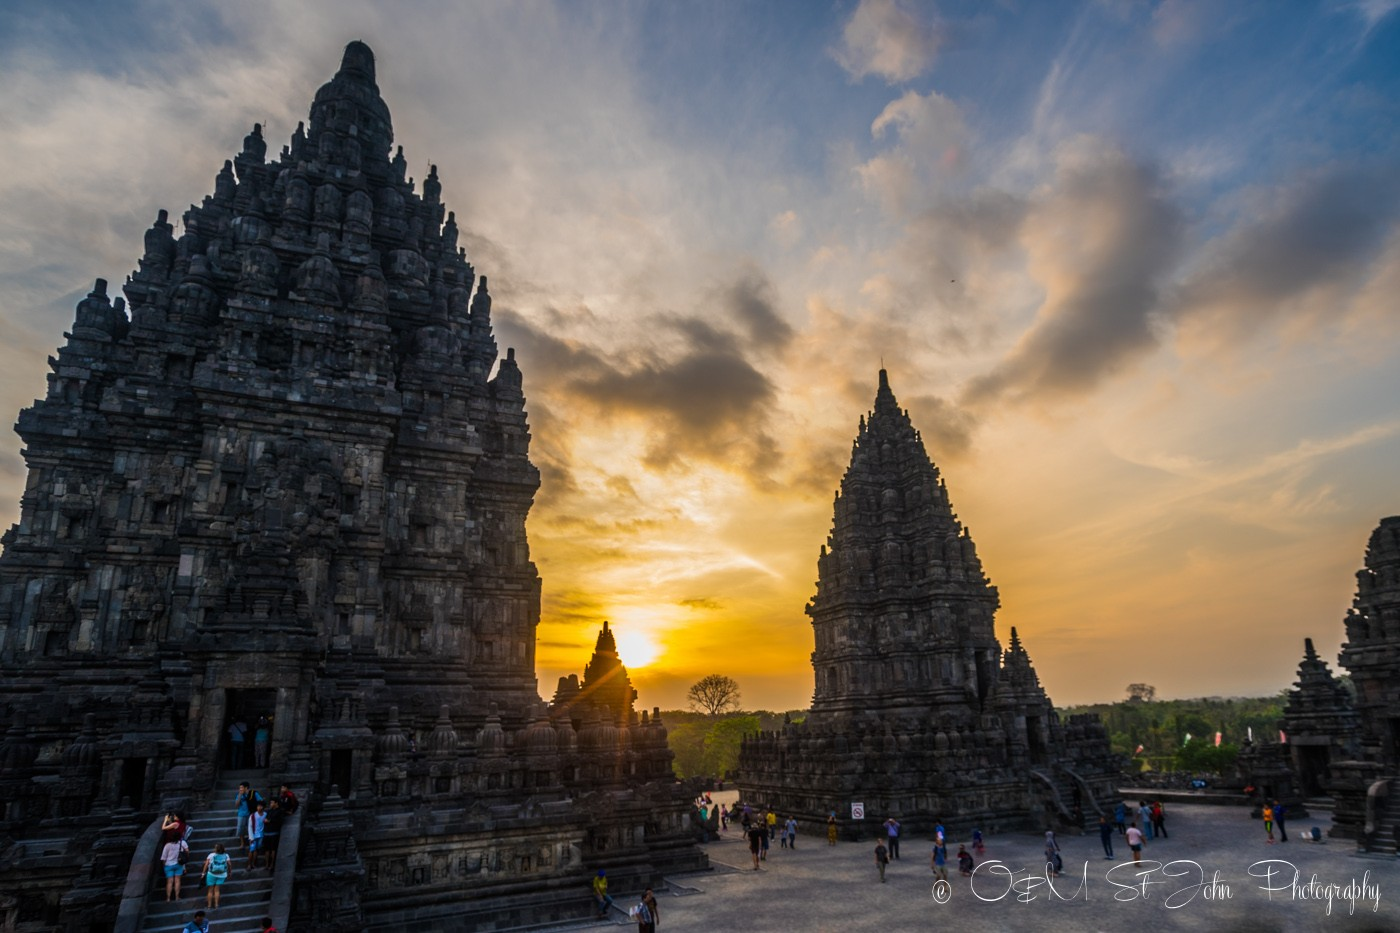 Top places to visit in Yogyakarta are Prambanan Temples